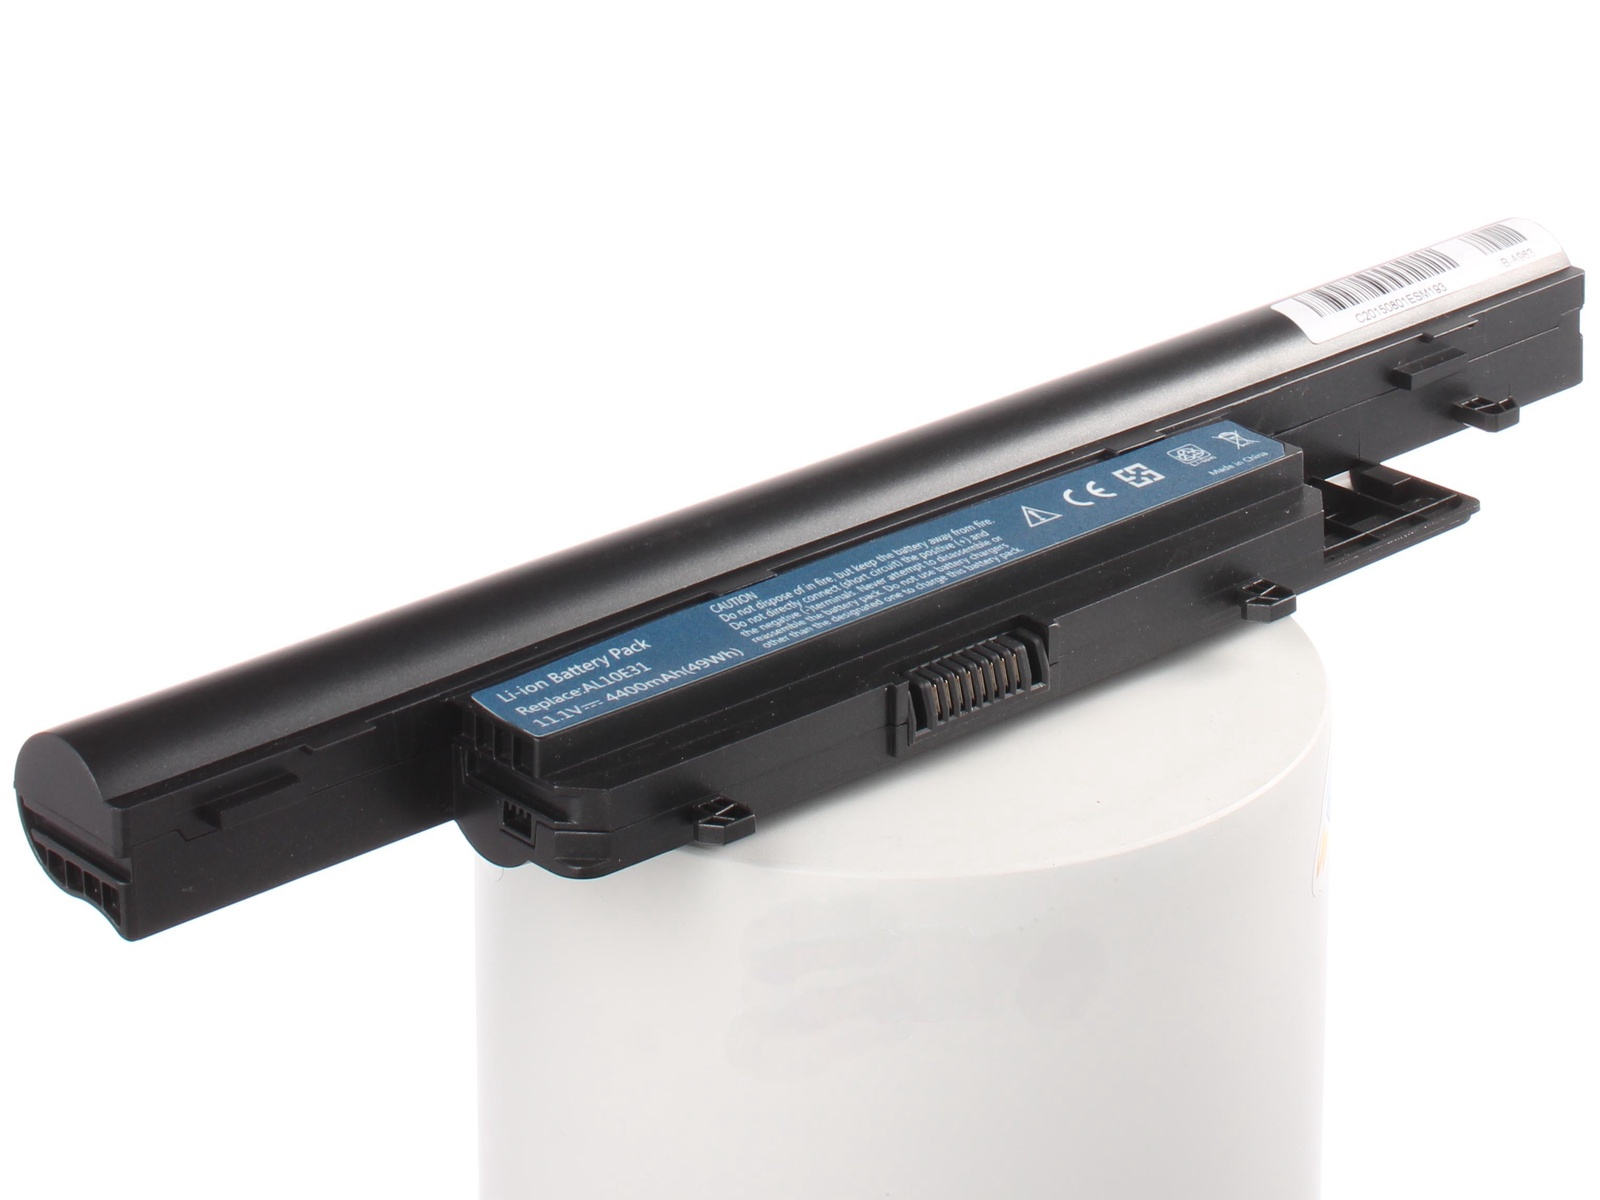 Фото - Аккумулятор для ноутбука iBatt Packard Bell AS10H75, AS10H31, AS10H51 аккумулятор